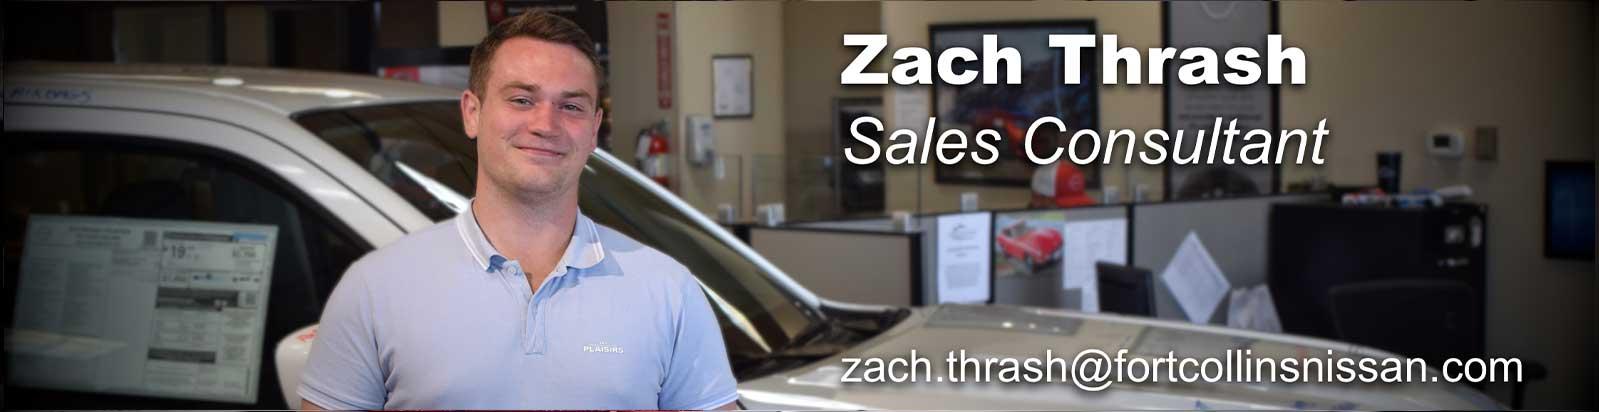 Zach Thrash